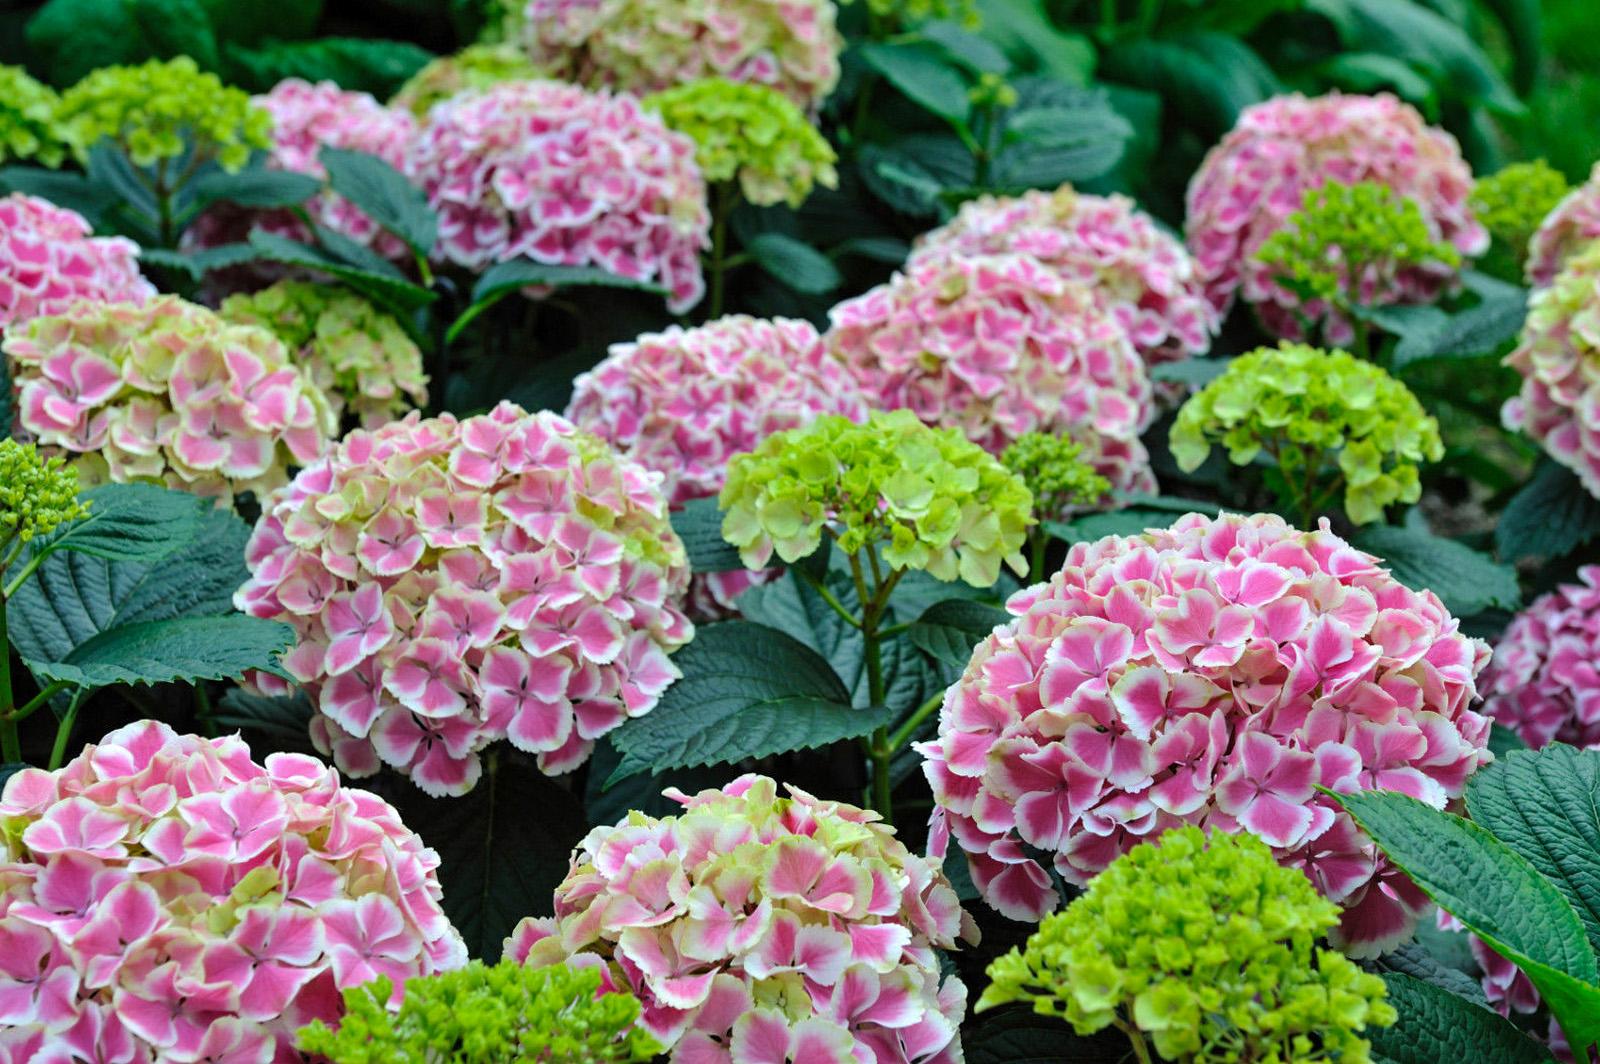 Hortenzijų spalvos